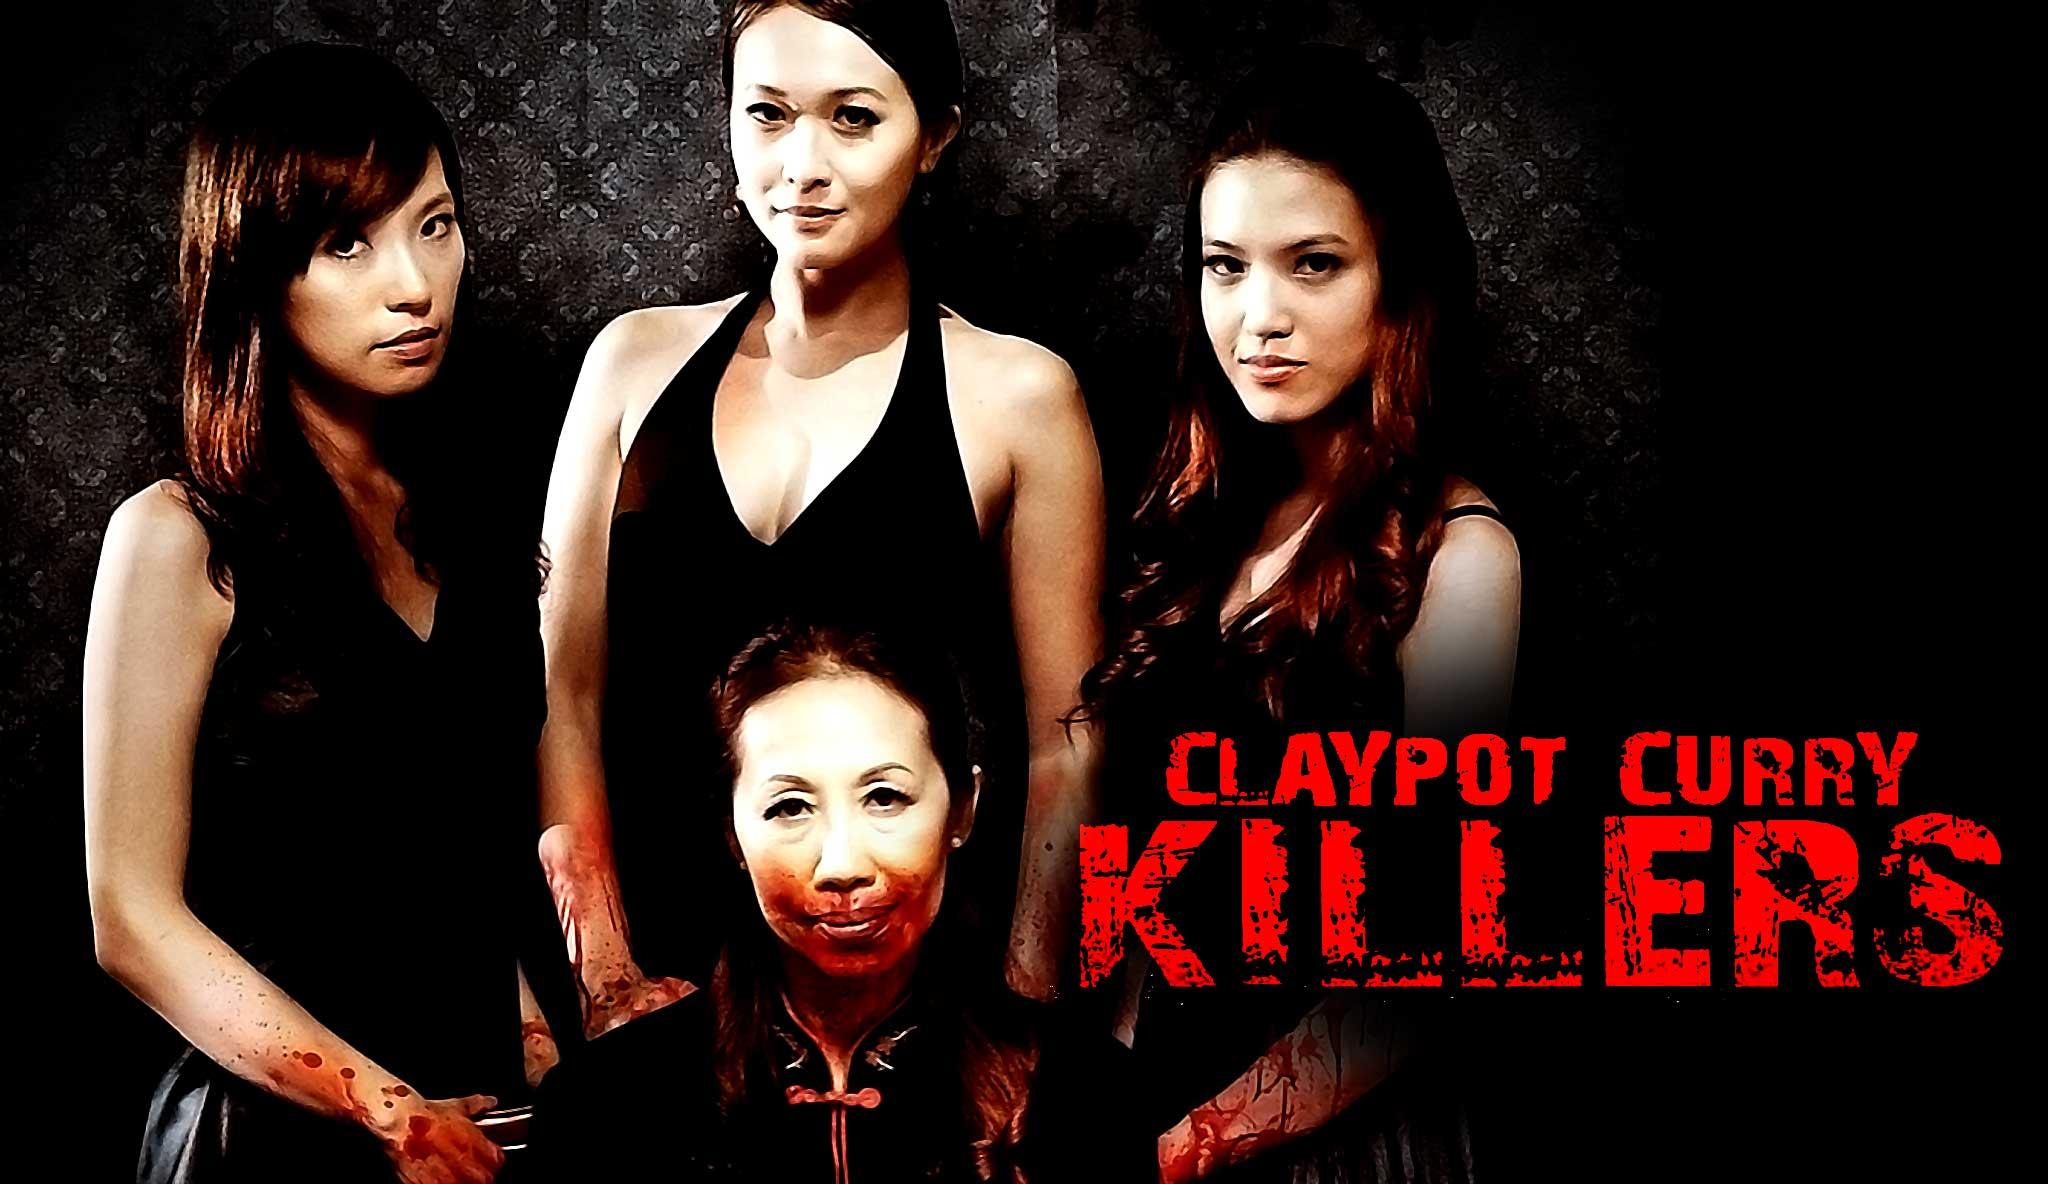 claypot-curry-killers\header.jpg